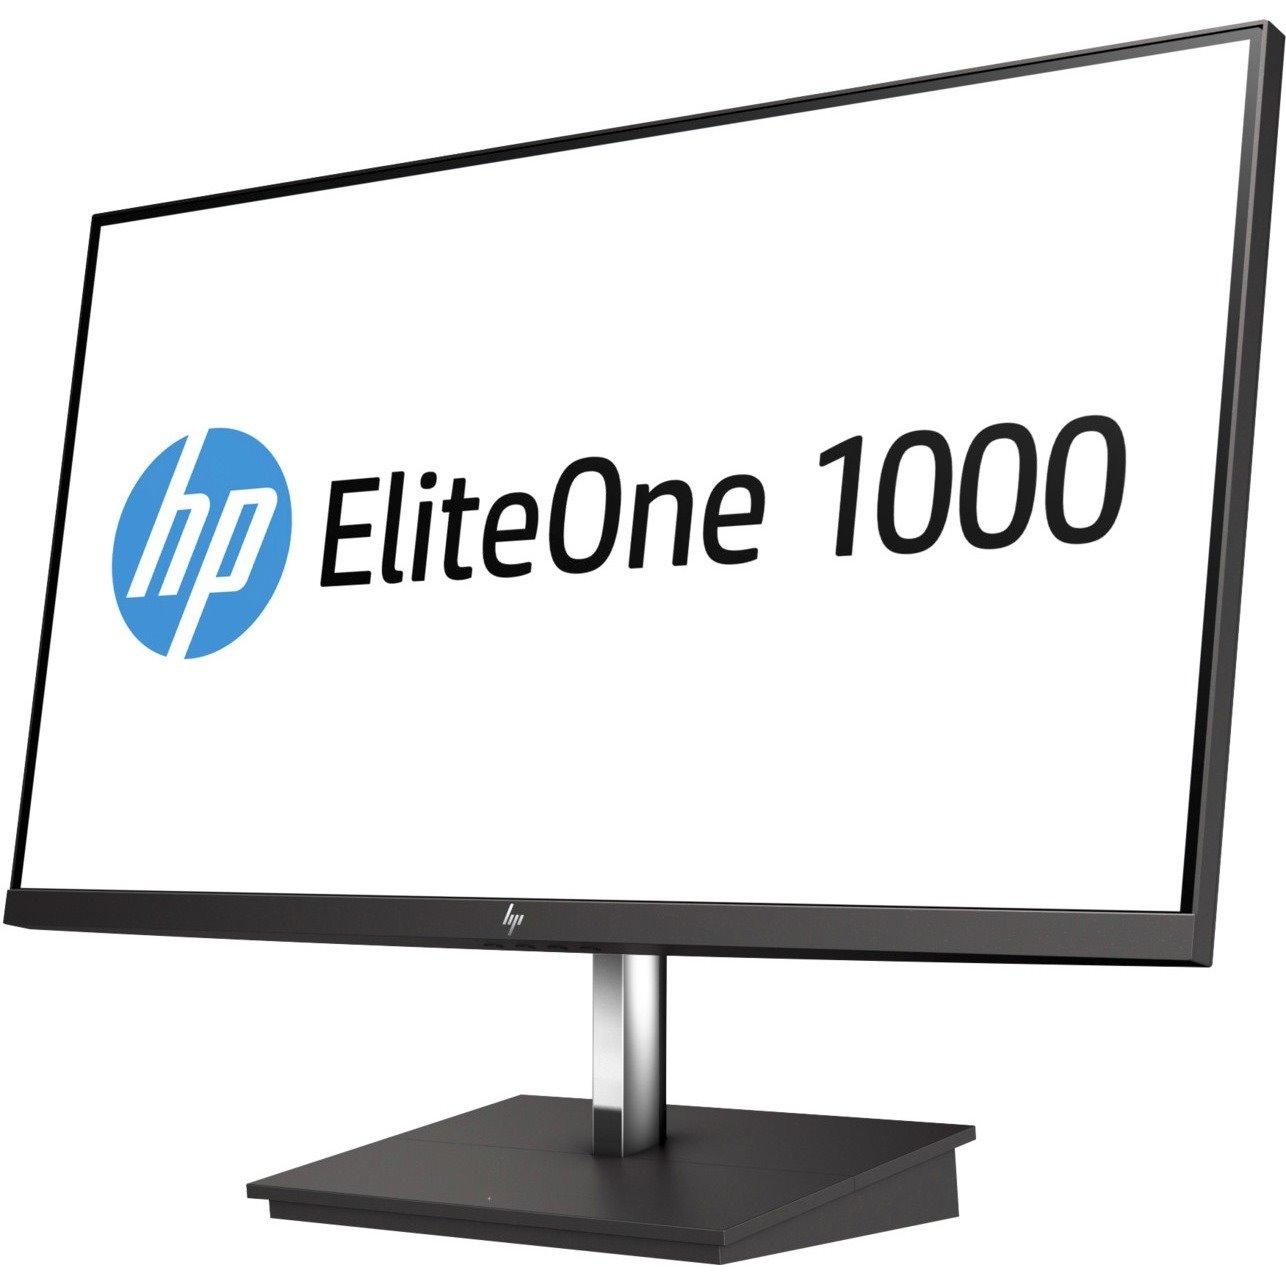 "HP EliteOne 1000 60.5 cm (23.8"") Full HD WLED LCD Monitor - 16:9 - Black, Silver"